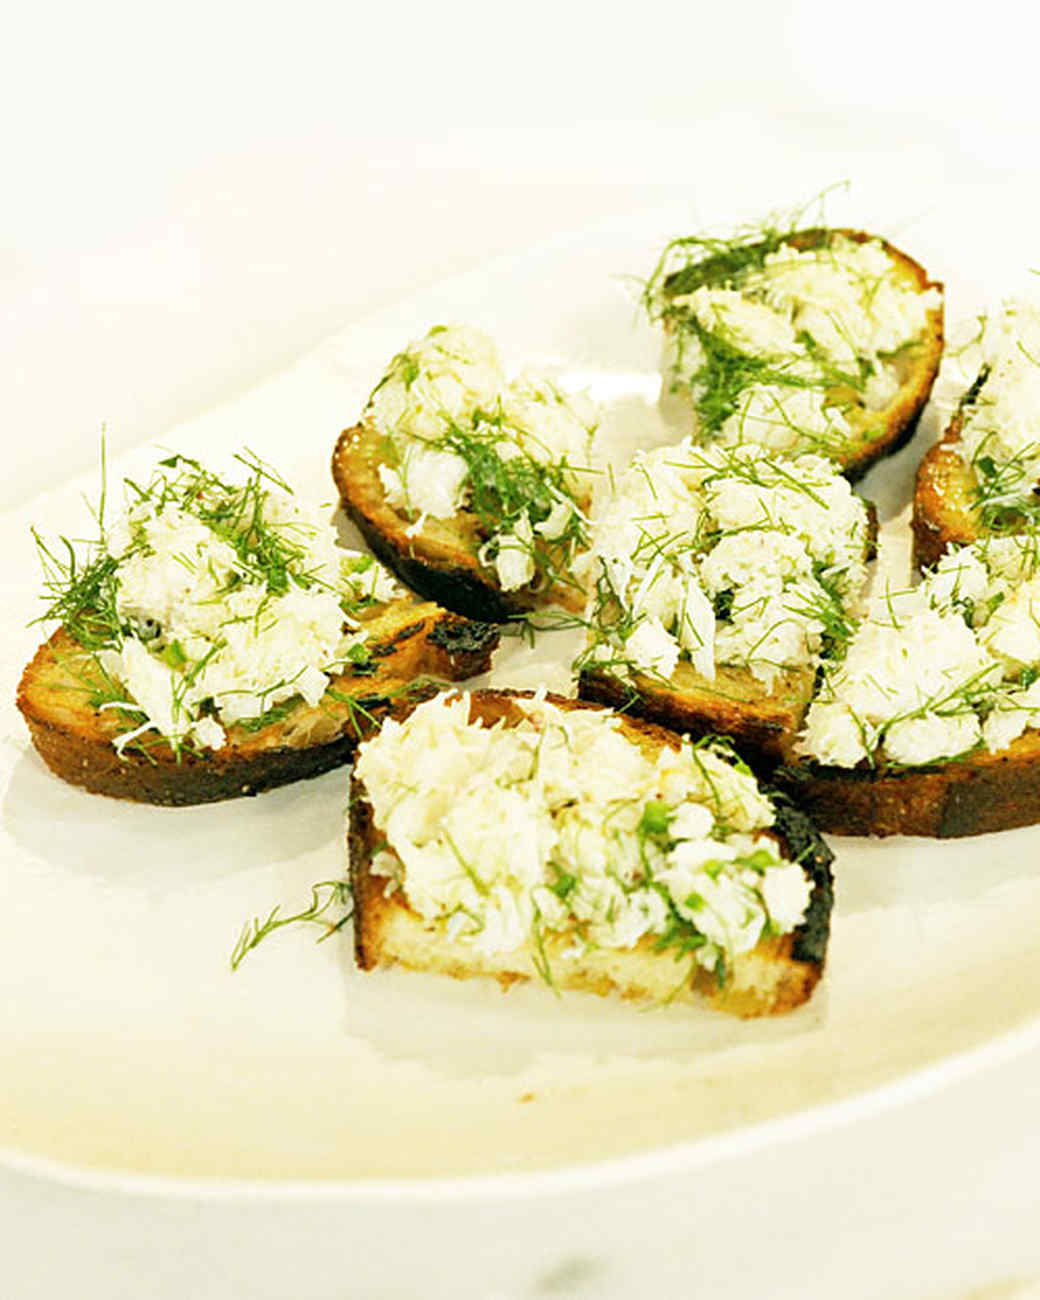 6006_091510_crab_toast.jpg